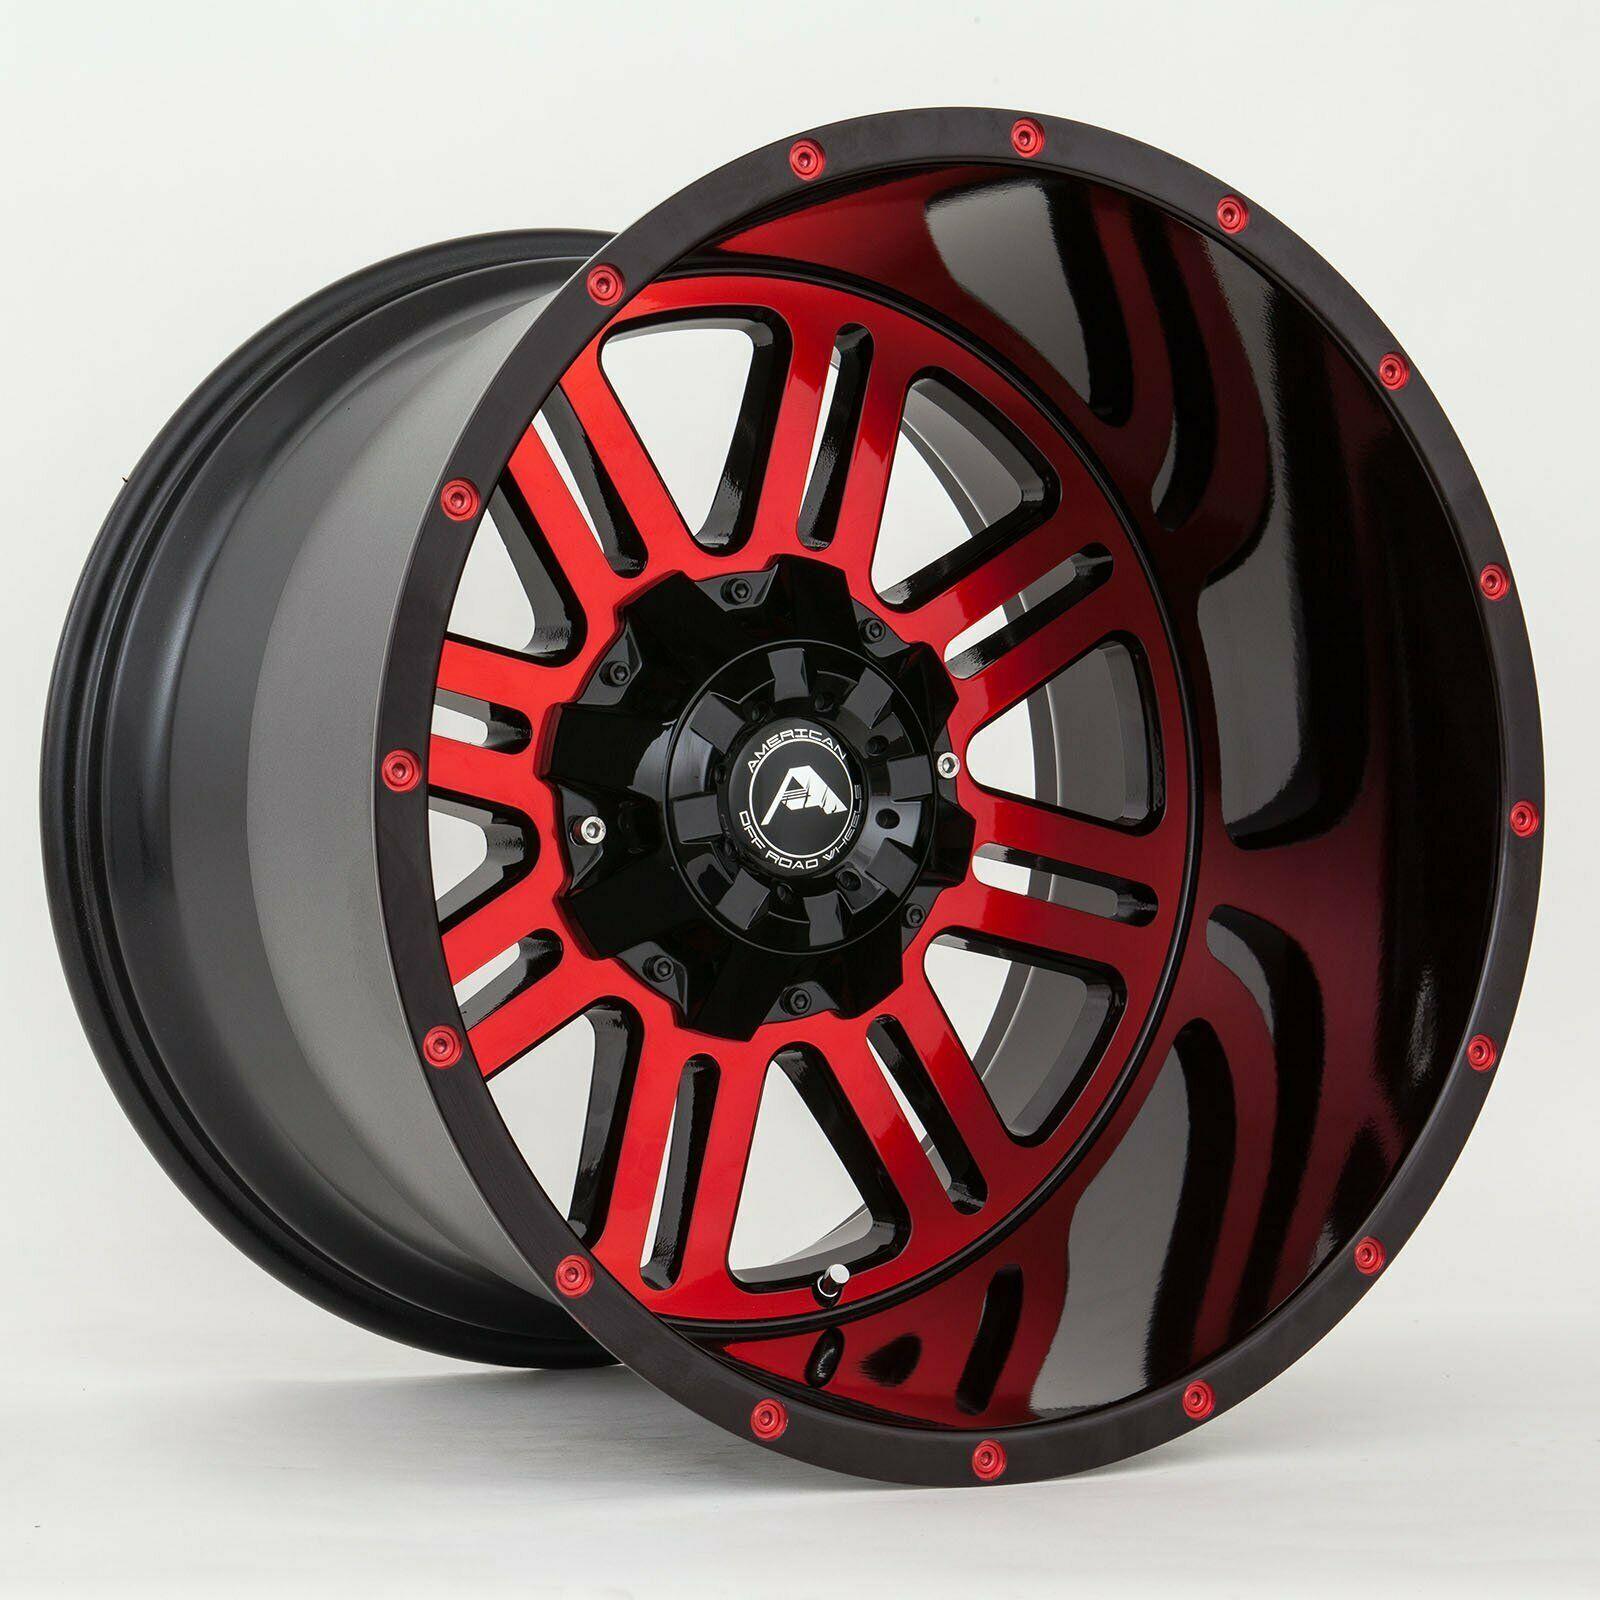 20 Rims 6x5 5 in 2020 Wheel rims, Off road wheels, Rims